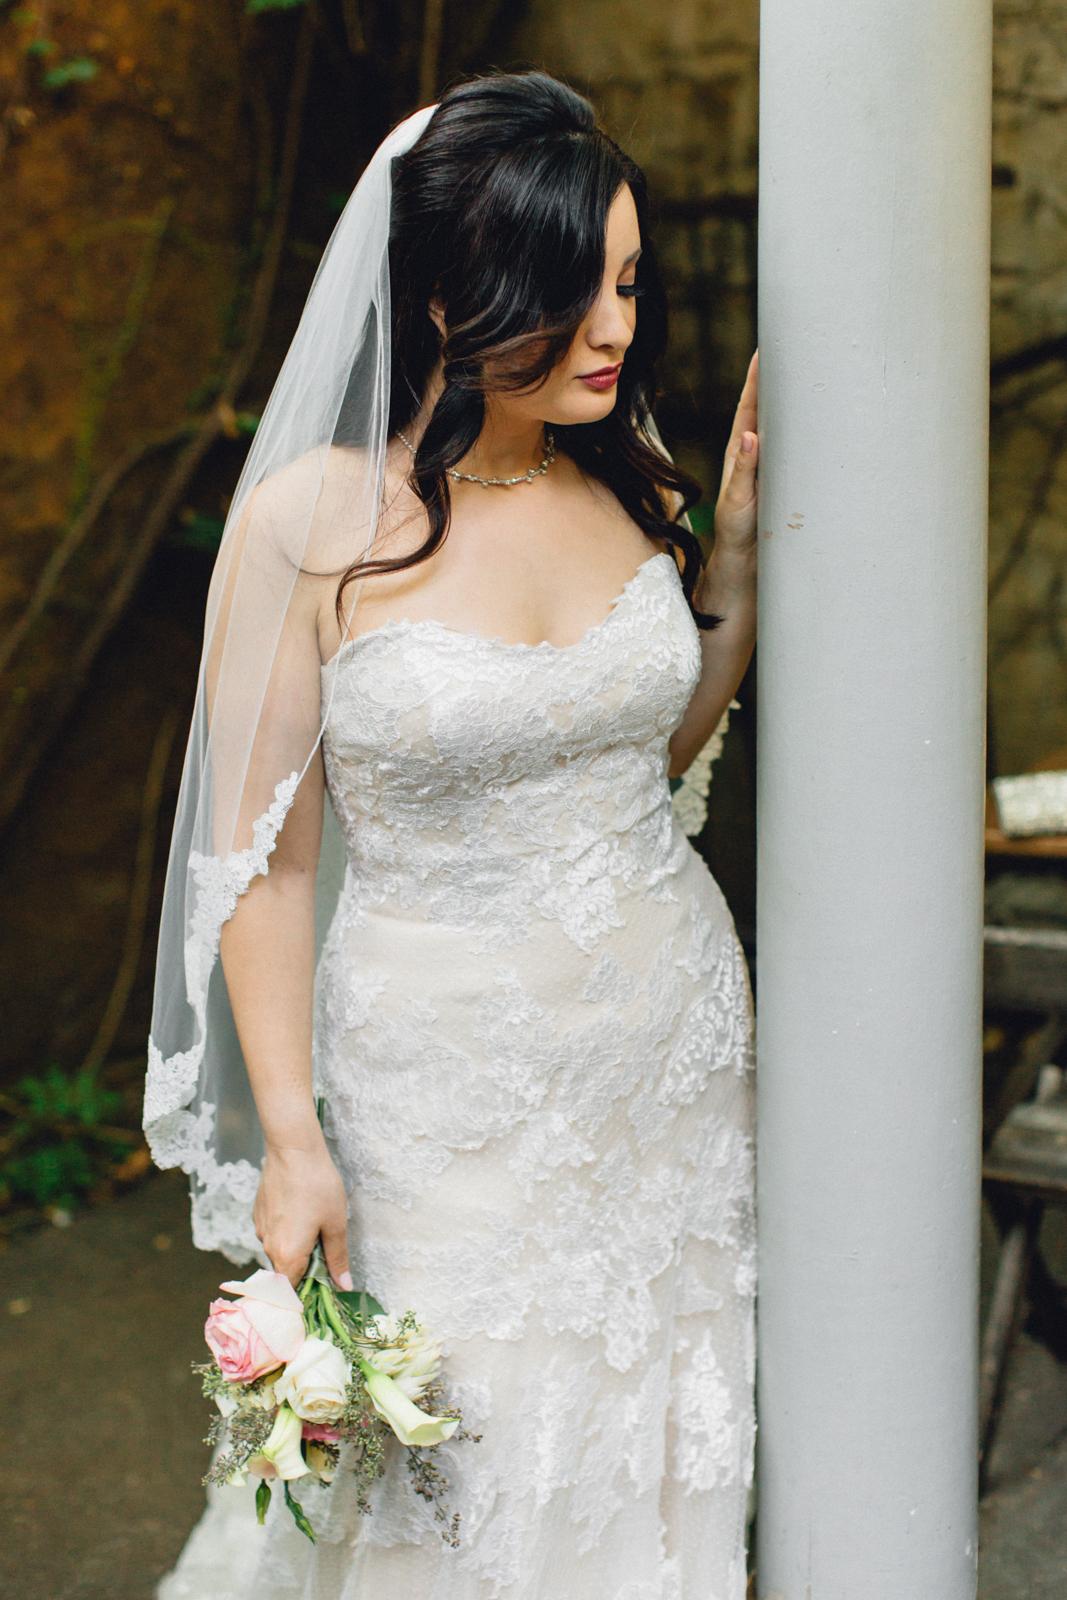 NYC Wedding Photography Lofts at Prince Brooklyn NYC Photographer Boris Zaretsky _B2C0451.jpg